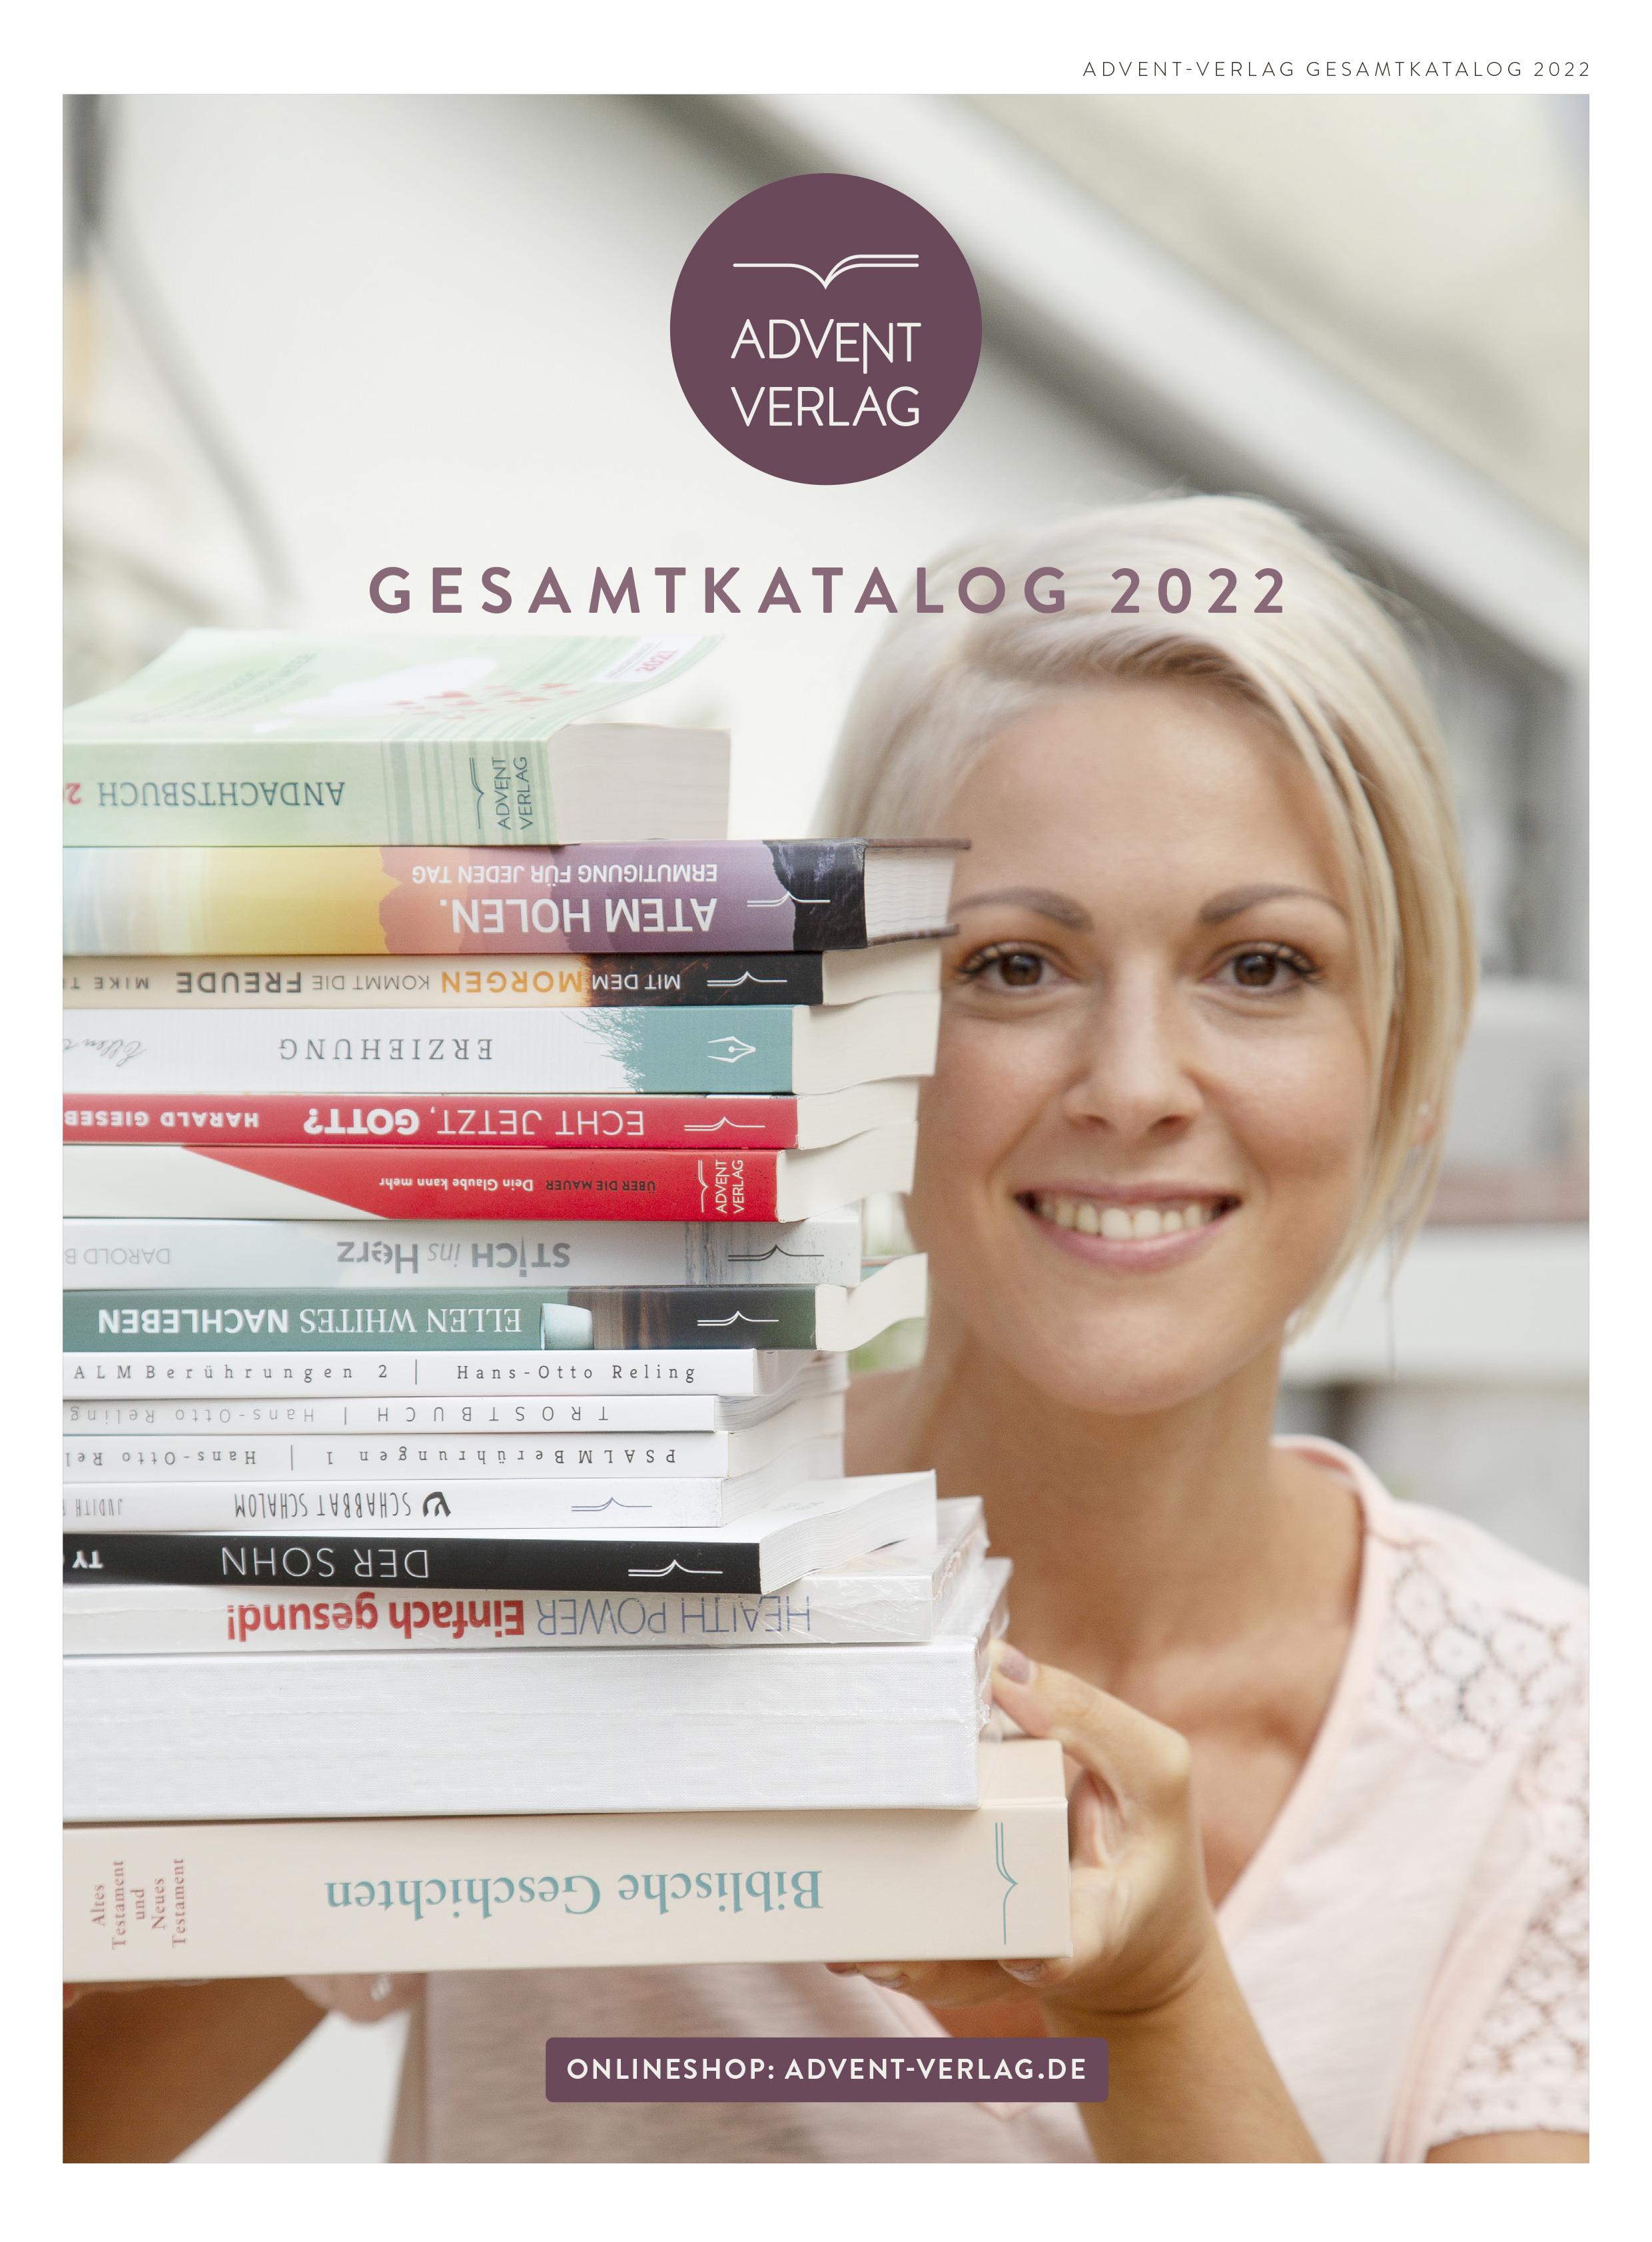 Advent-Verlag Gesamtkatalog